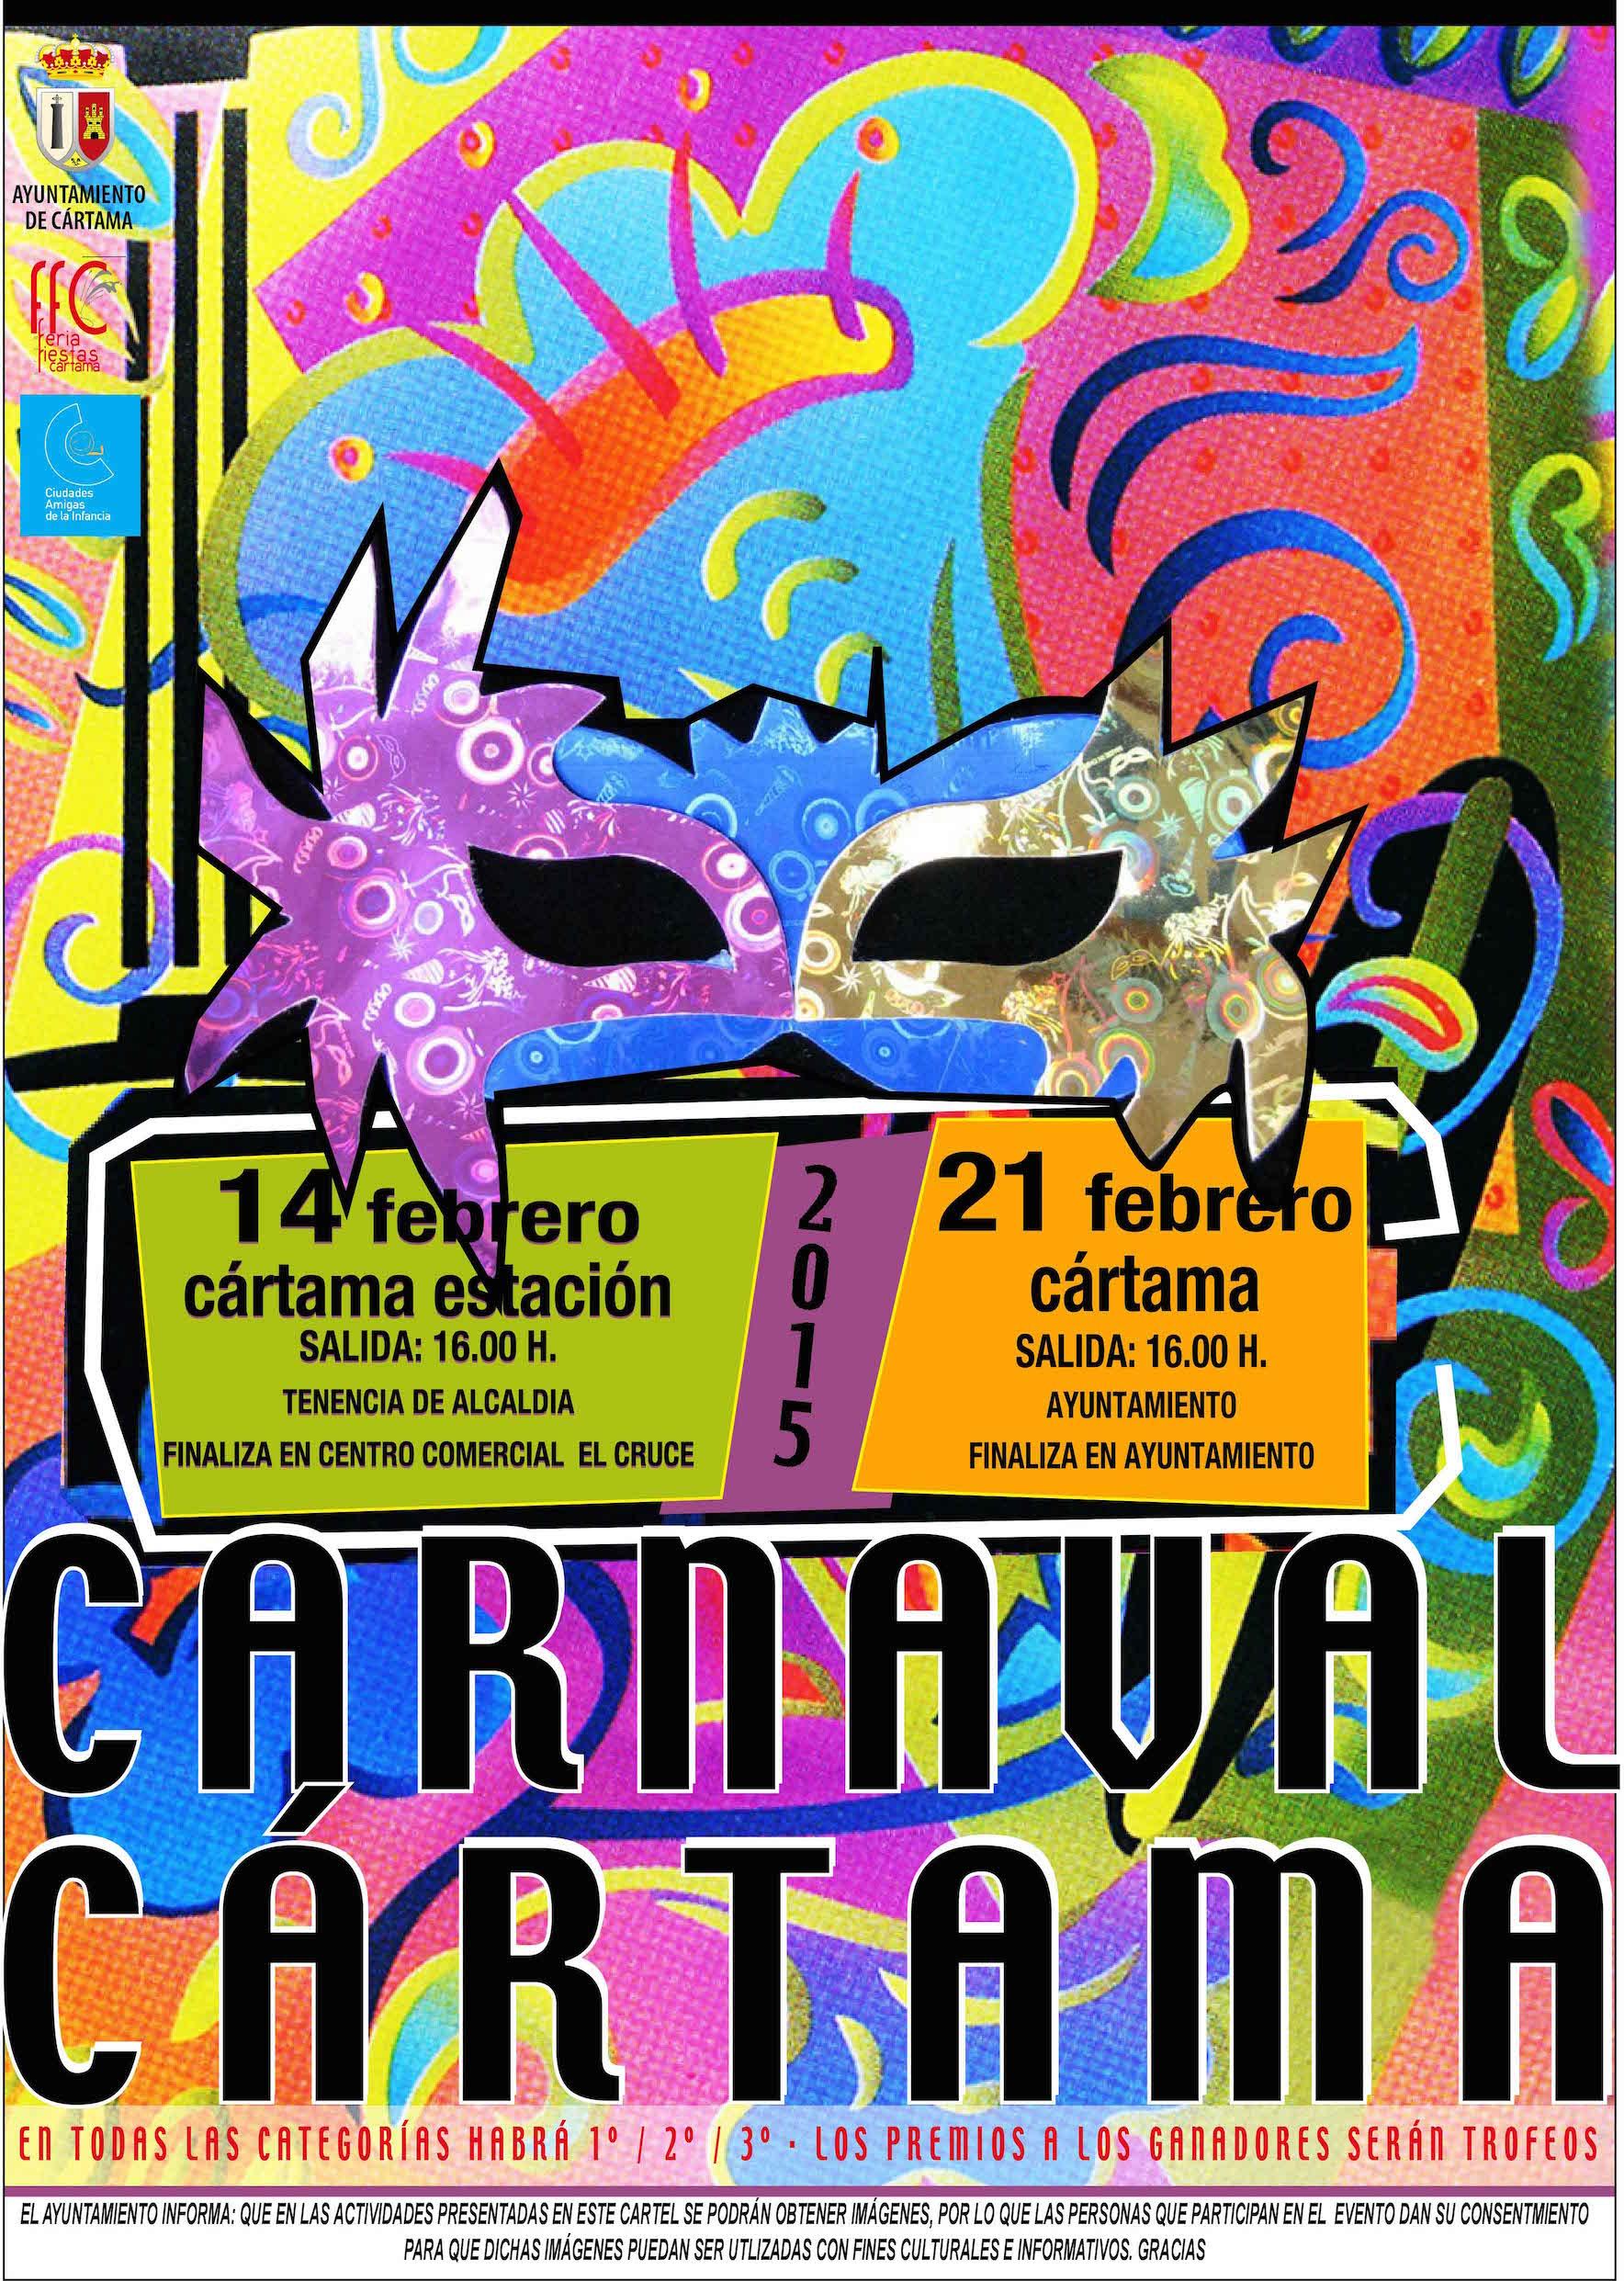 Cártama se prepara para celebrar el Carnaval 2015